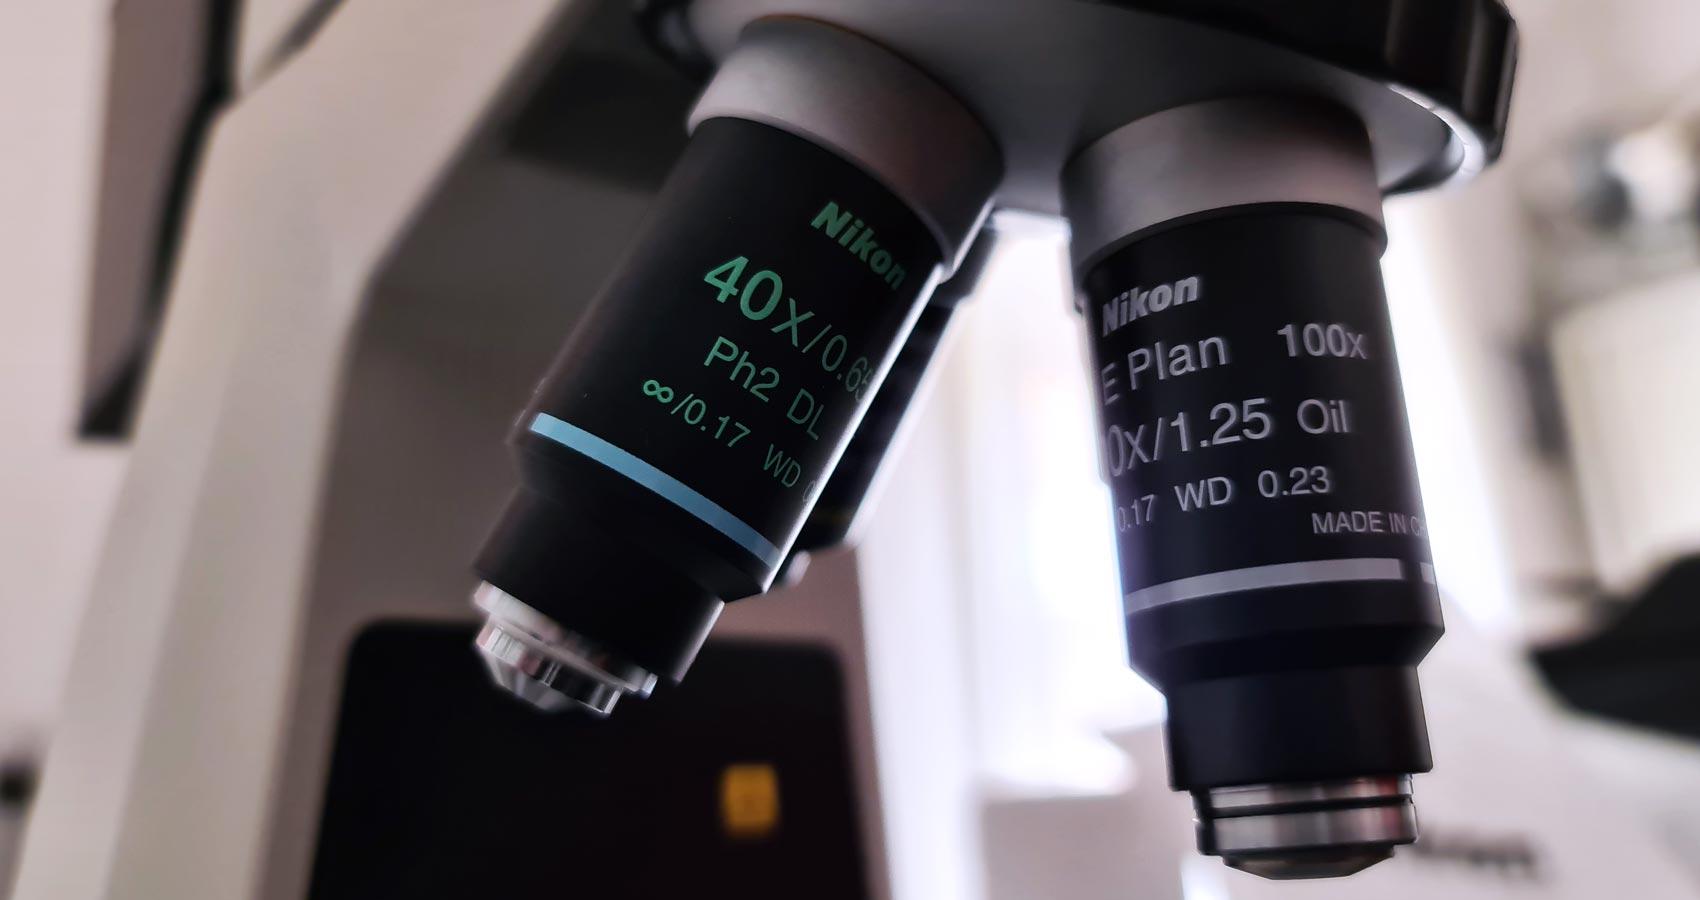 analisi-mediche-laboratorio-biotechnologies-agrigento-caltanissetta-san-giovanni-gemini-mussomeli-esami-sangue-emocromo-urine-6